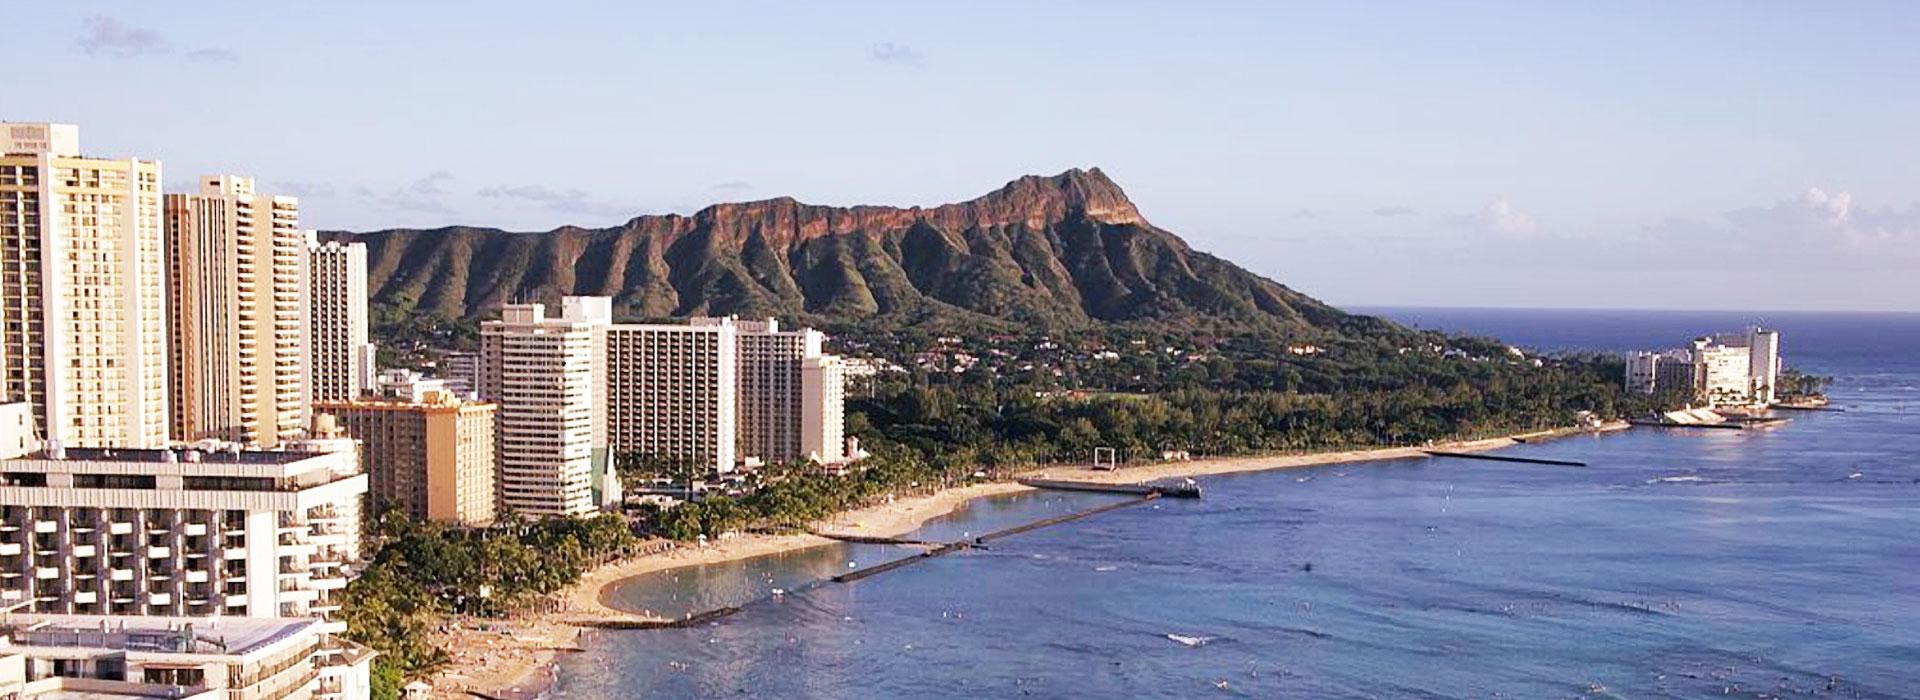 5D4N Oahu, Maui or Island of Hawaii (Big Island)